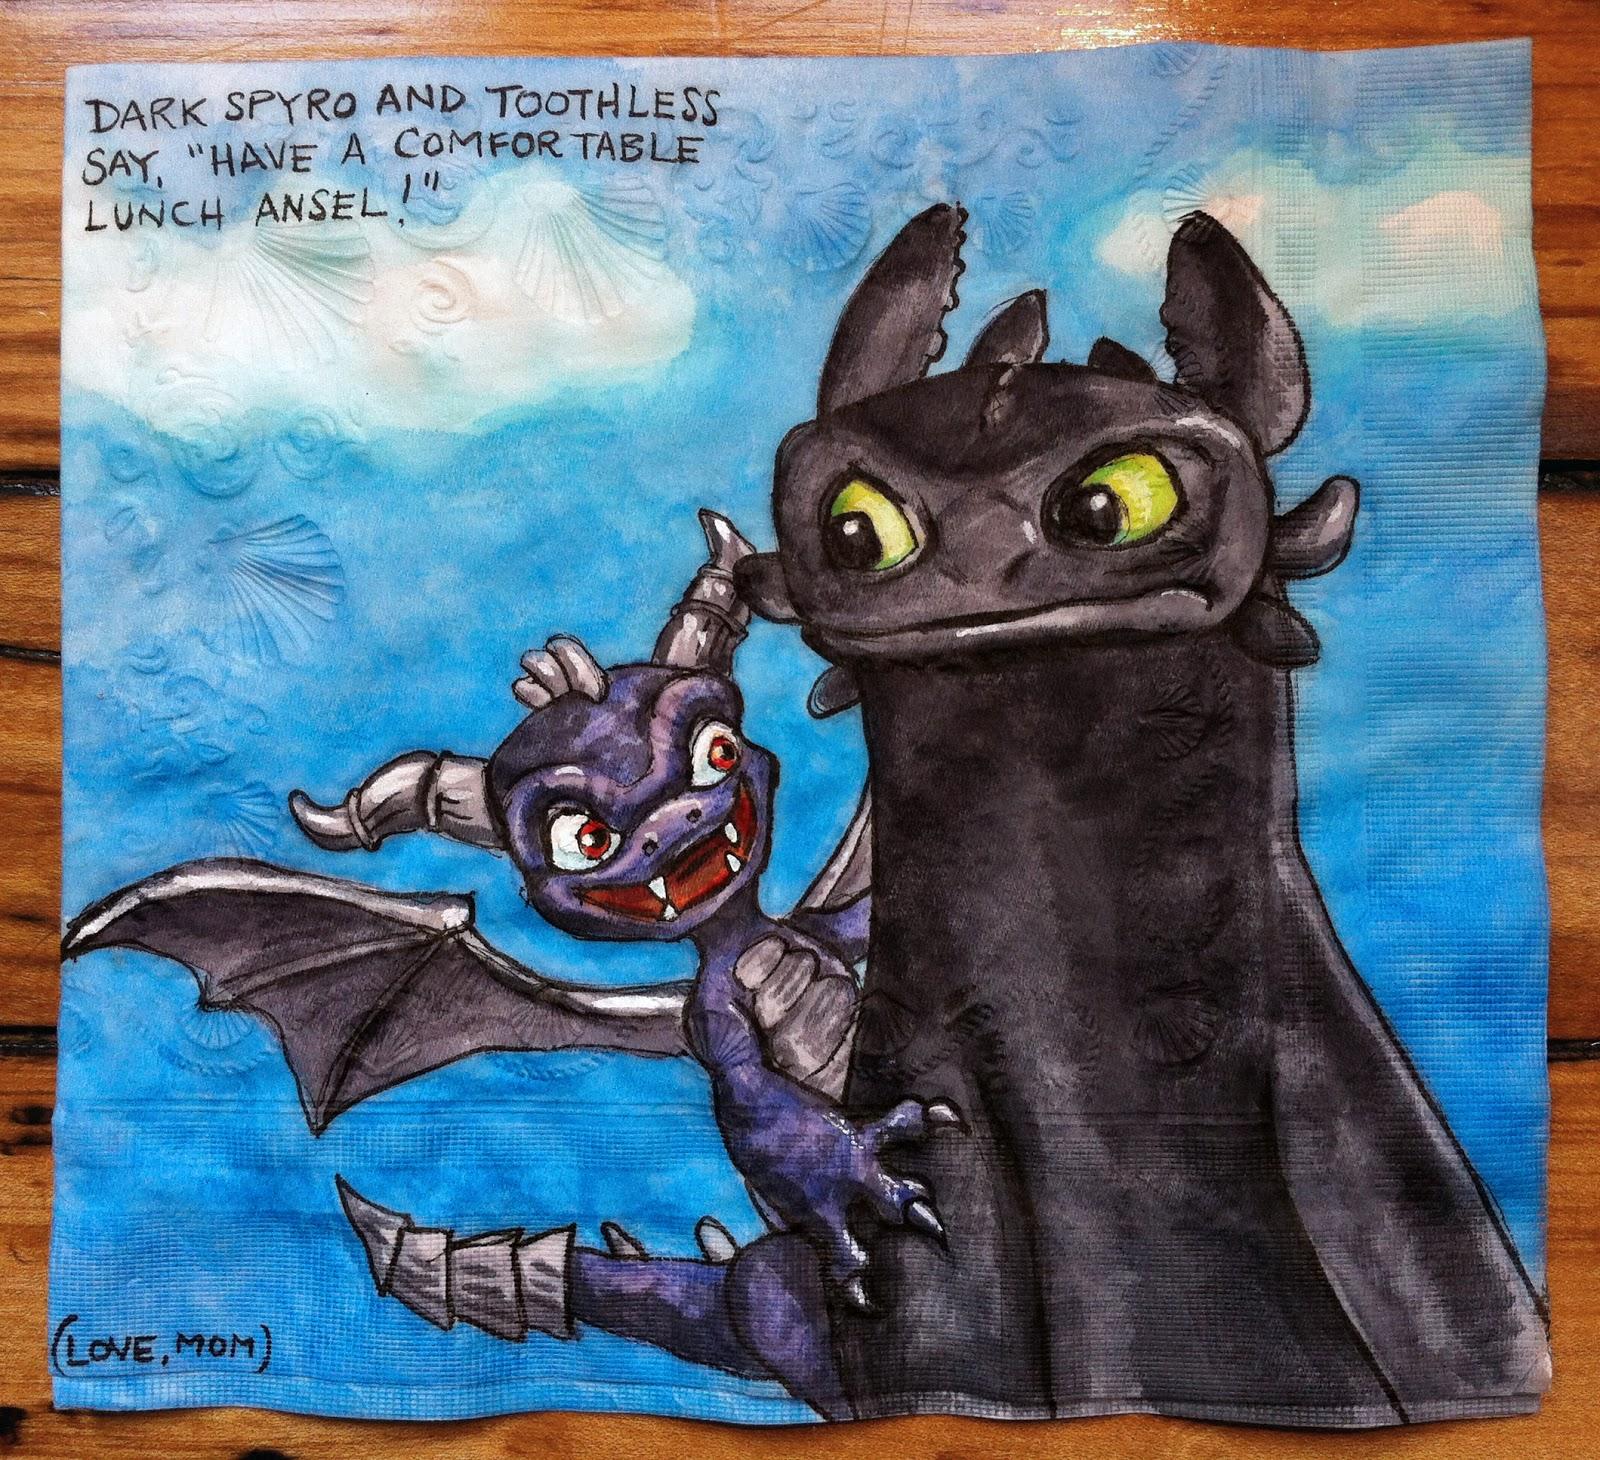 Daily Napkins: Dark Spyro from Skylanders and Toothless - photo#26